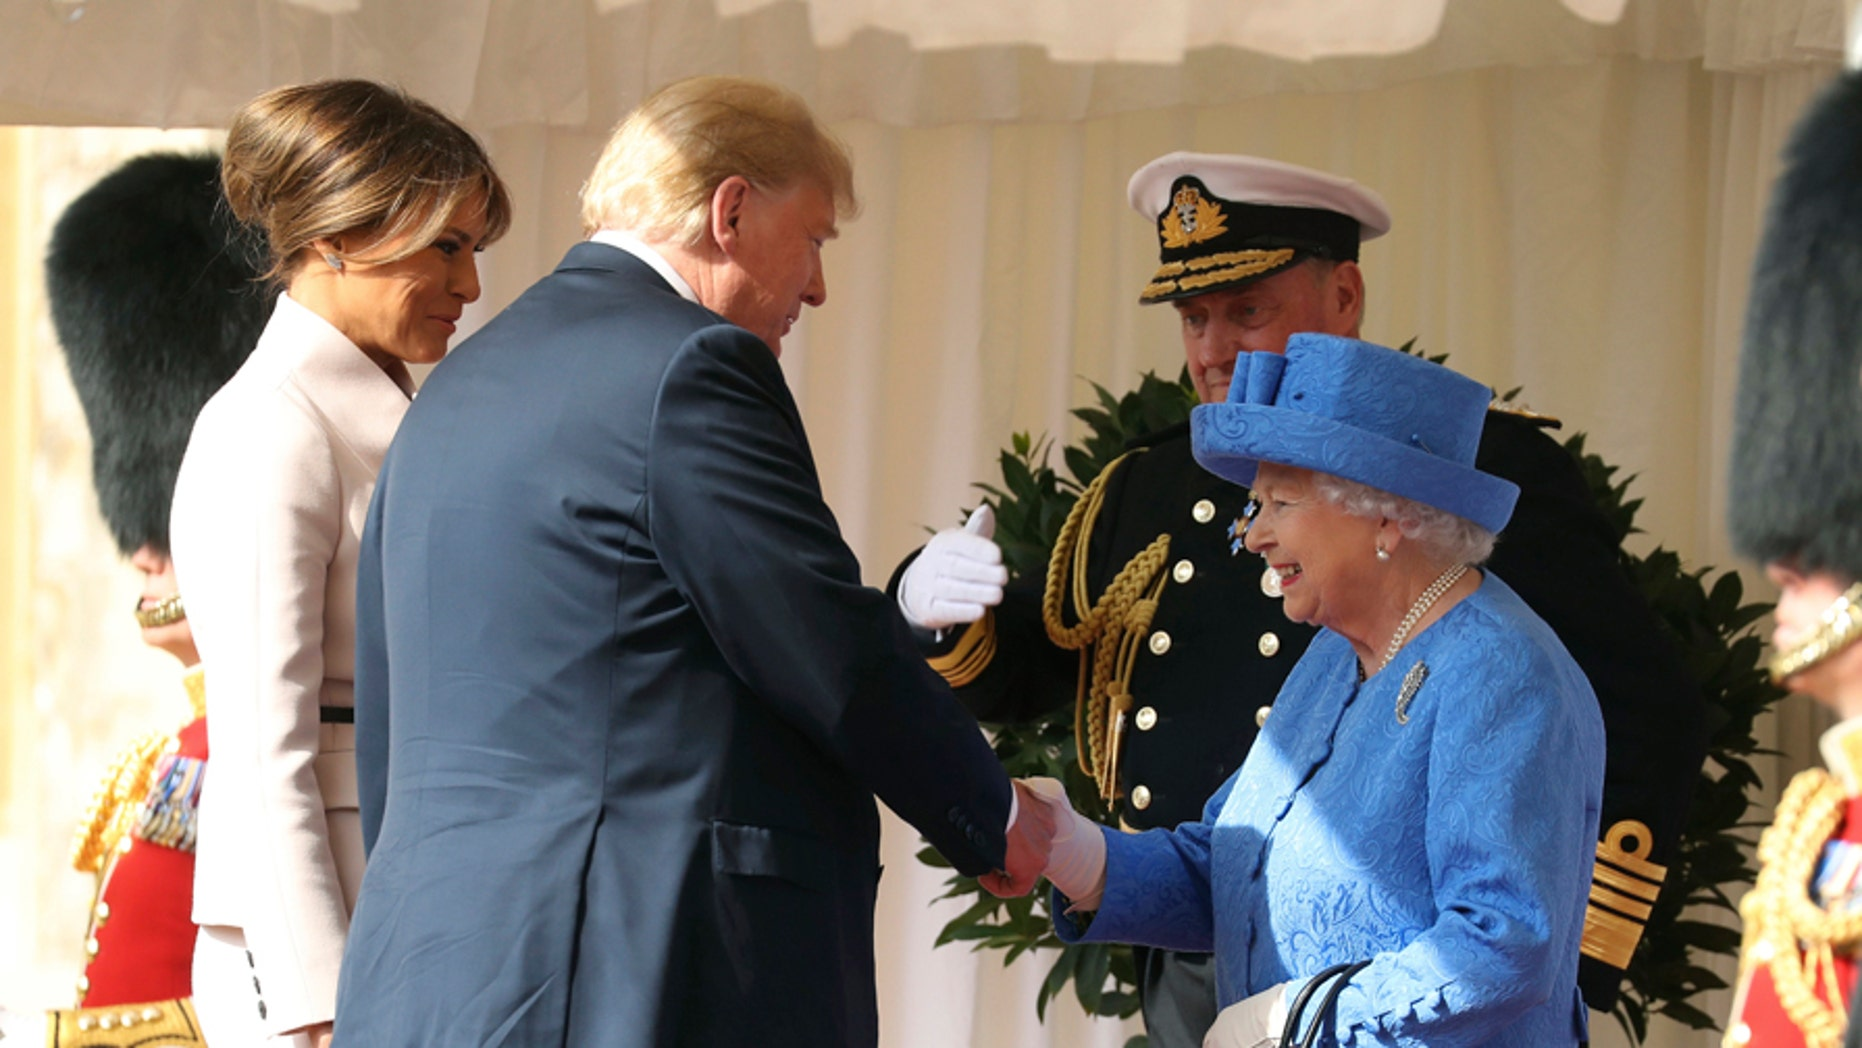 President Trump and First Lady Melania Trump met Queen Elizabeth II Friday at Windsor Castle.